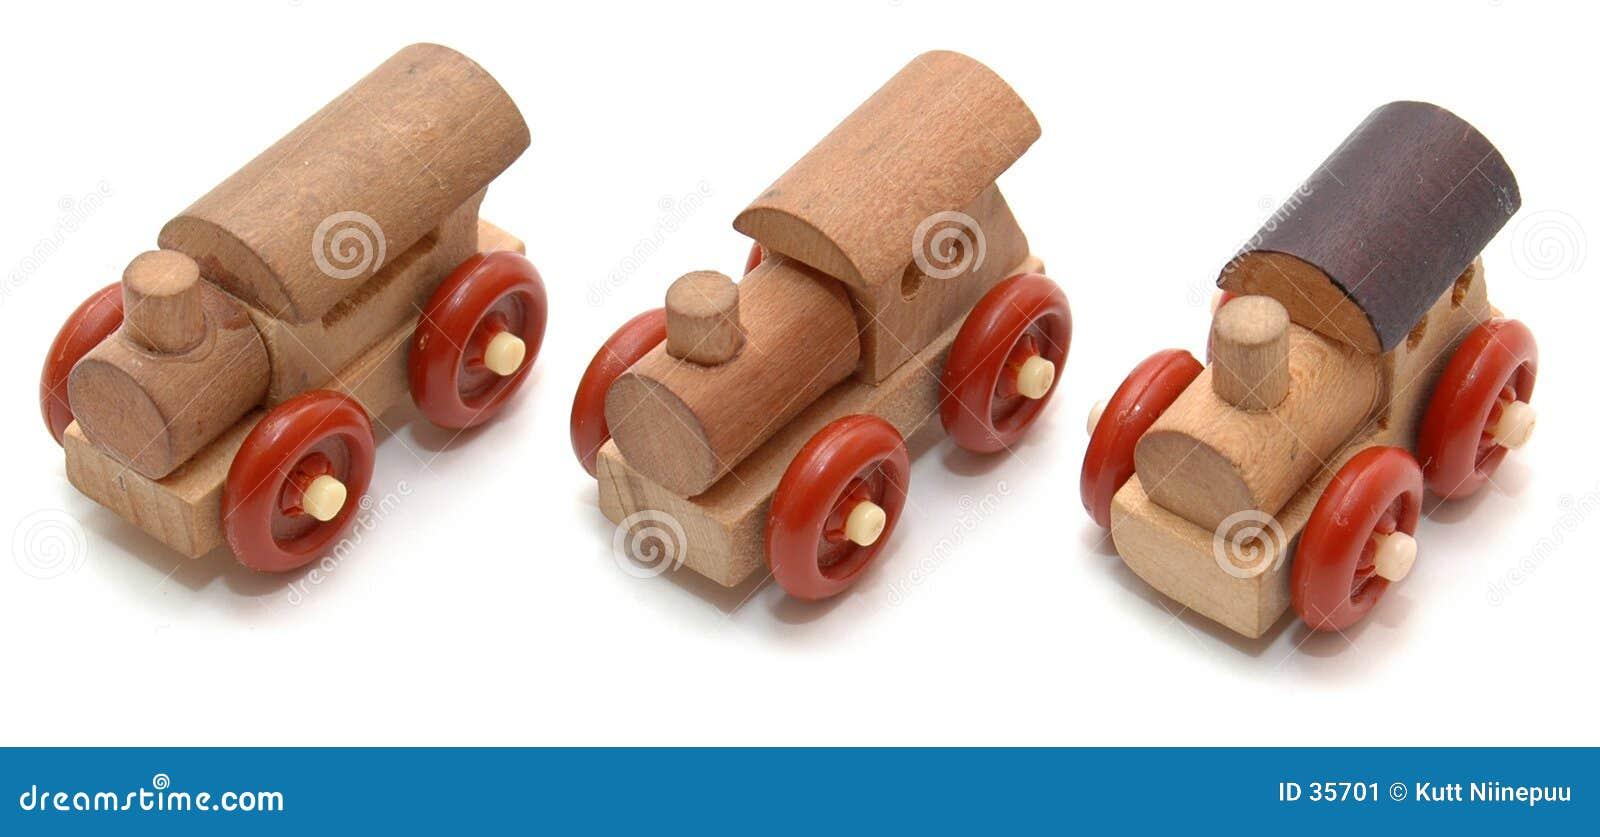 Download Tres carros minúsculos imagen de archivo. Imagen de juguetes - 35701